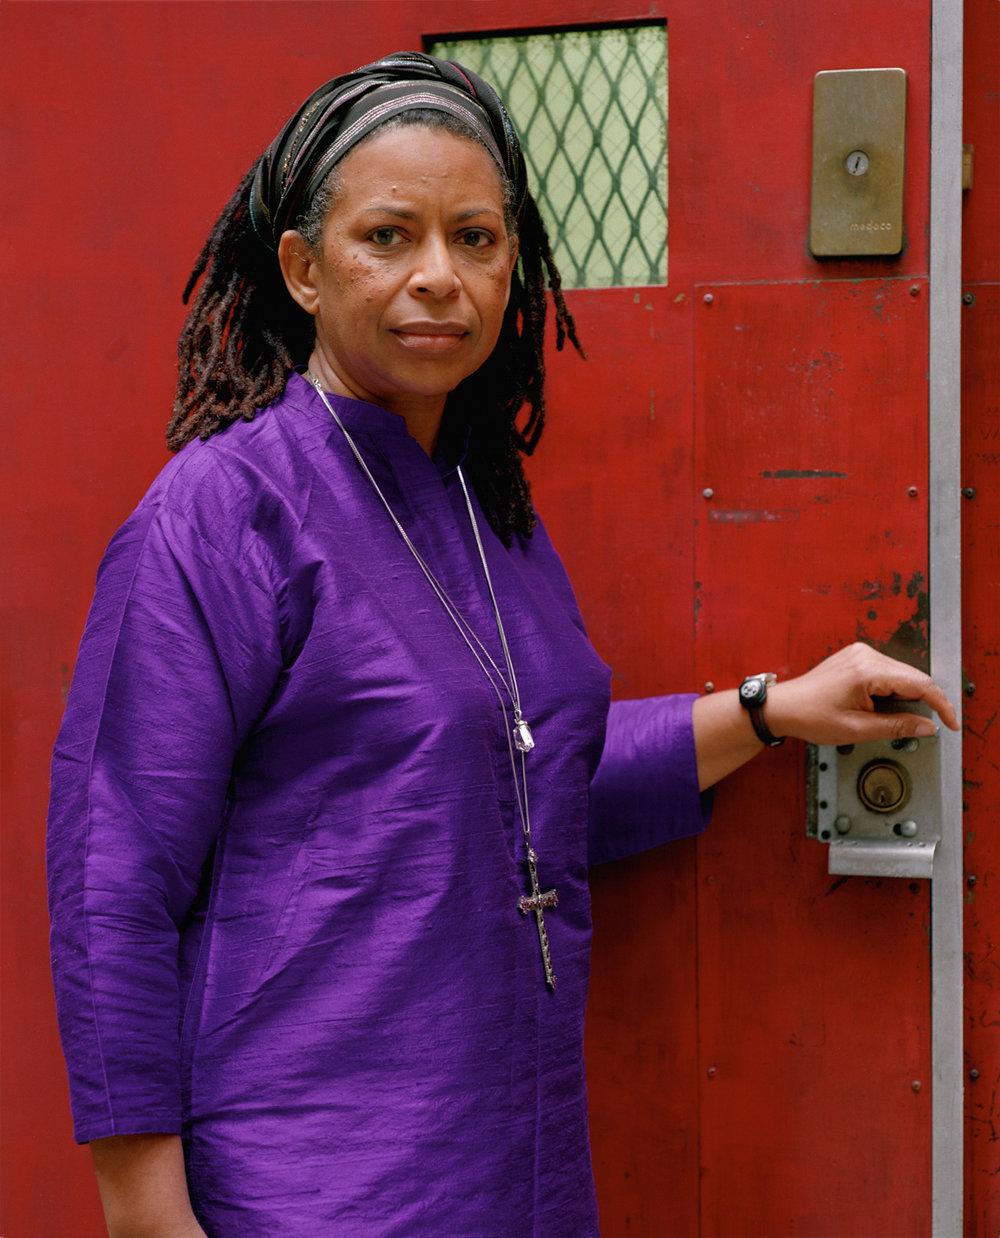 The Reverend Diane Winley